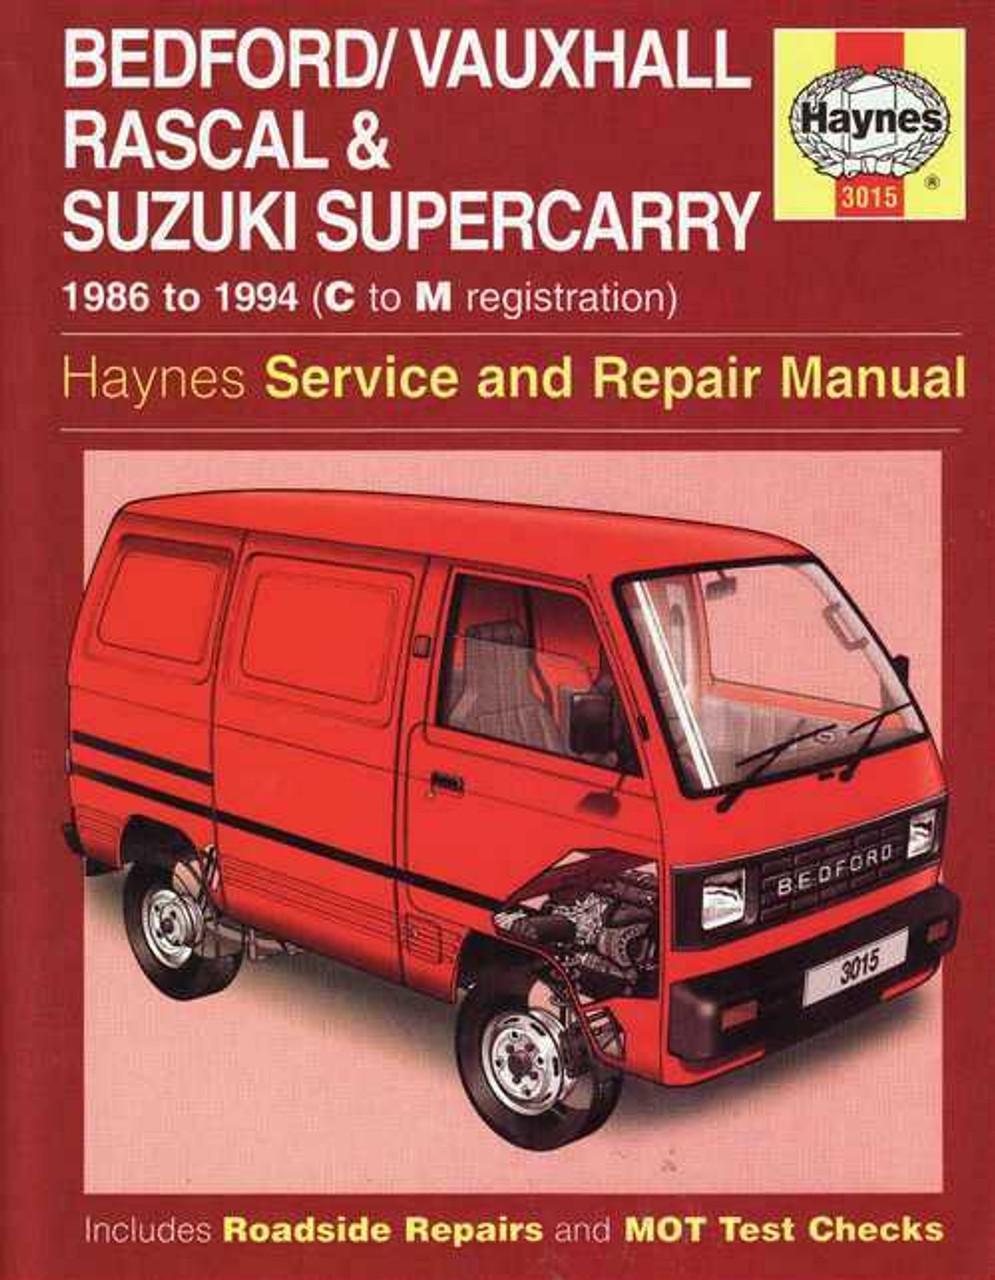 1990 BEDFORD RASCAL SUZUKI SUPER CARRY MICRO VAN /& PICK UP SALES BROCHURE